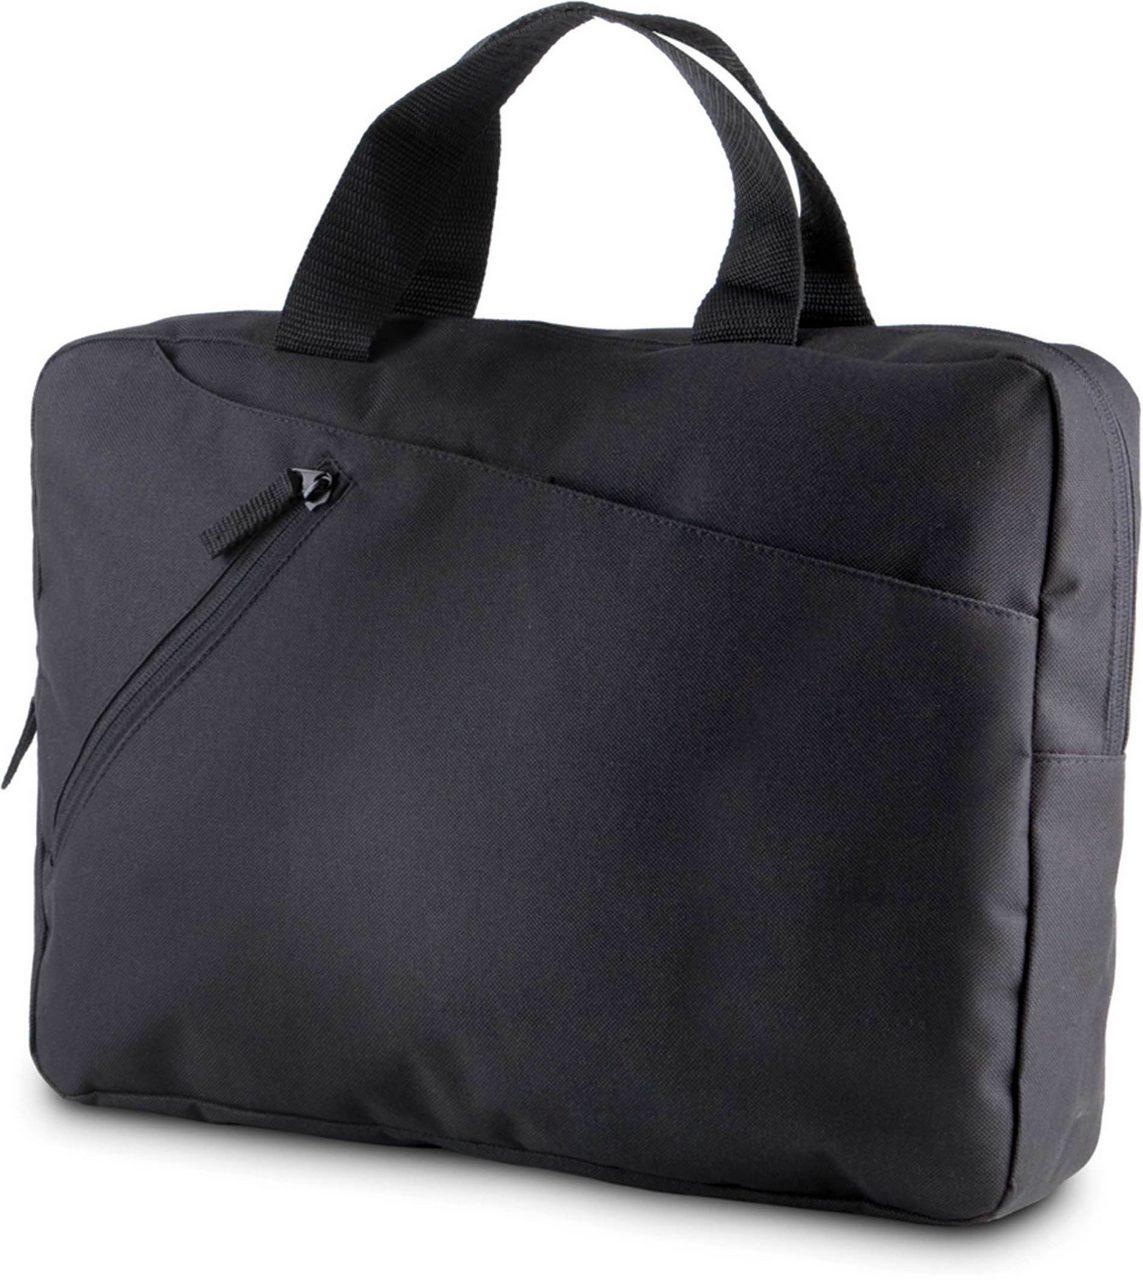 Geanta KI0402 neagra Genti rucsacuri personalizate conferinta laptop sport compartiment serigrafie broderie termotransfer